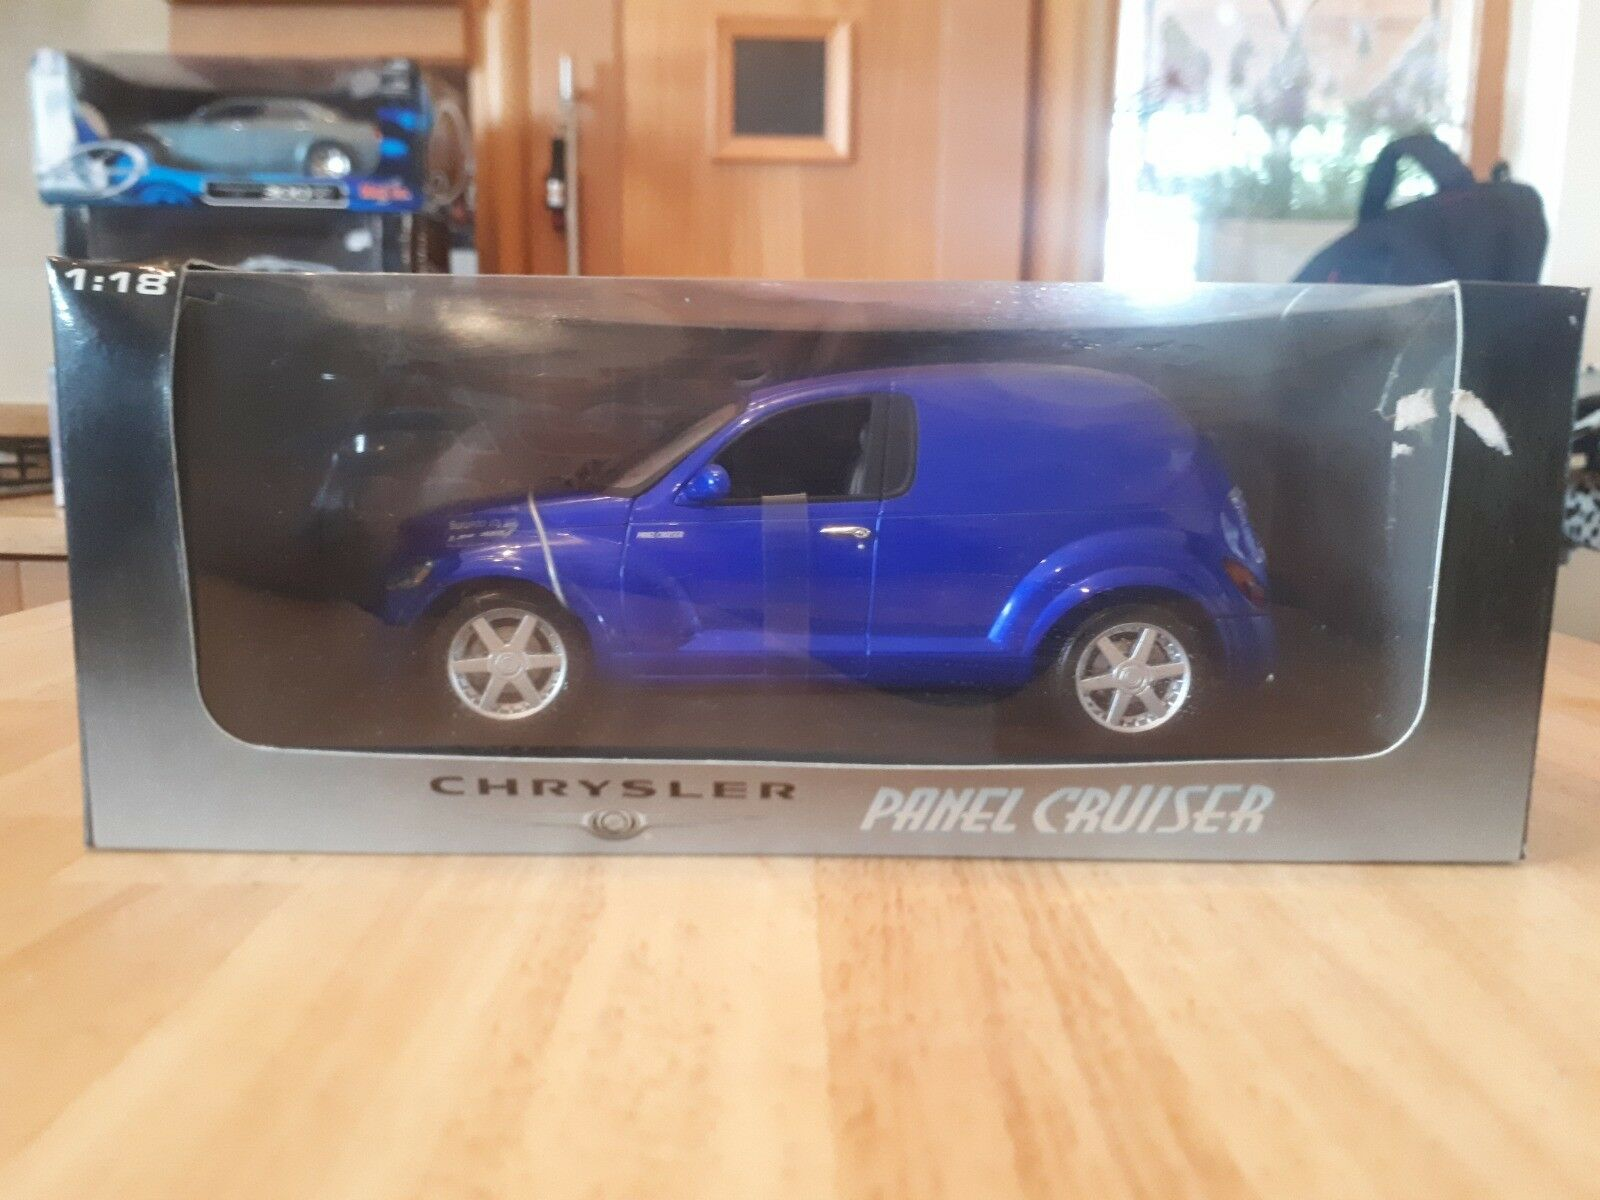 Autoart 1 18 Chrysler Panel Cruiser - azul